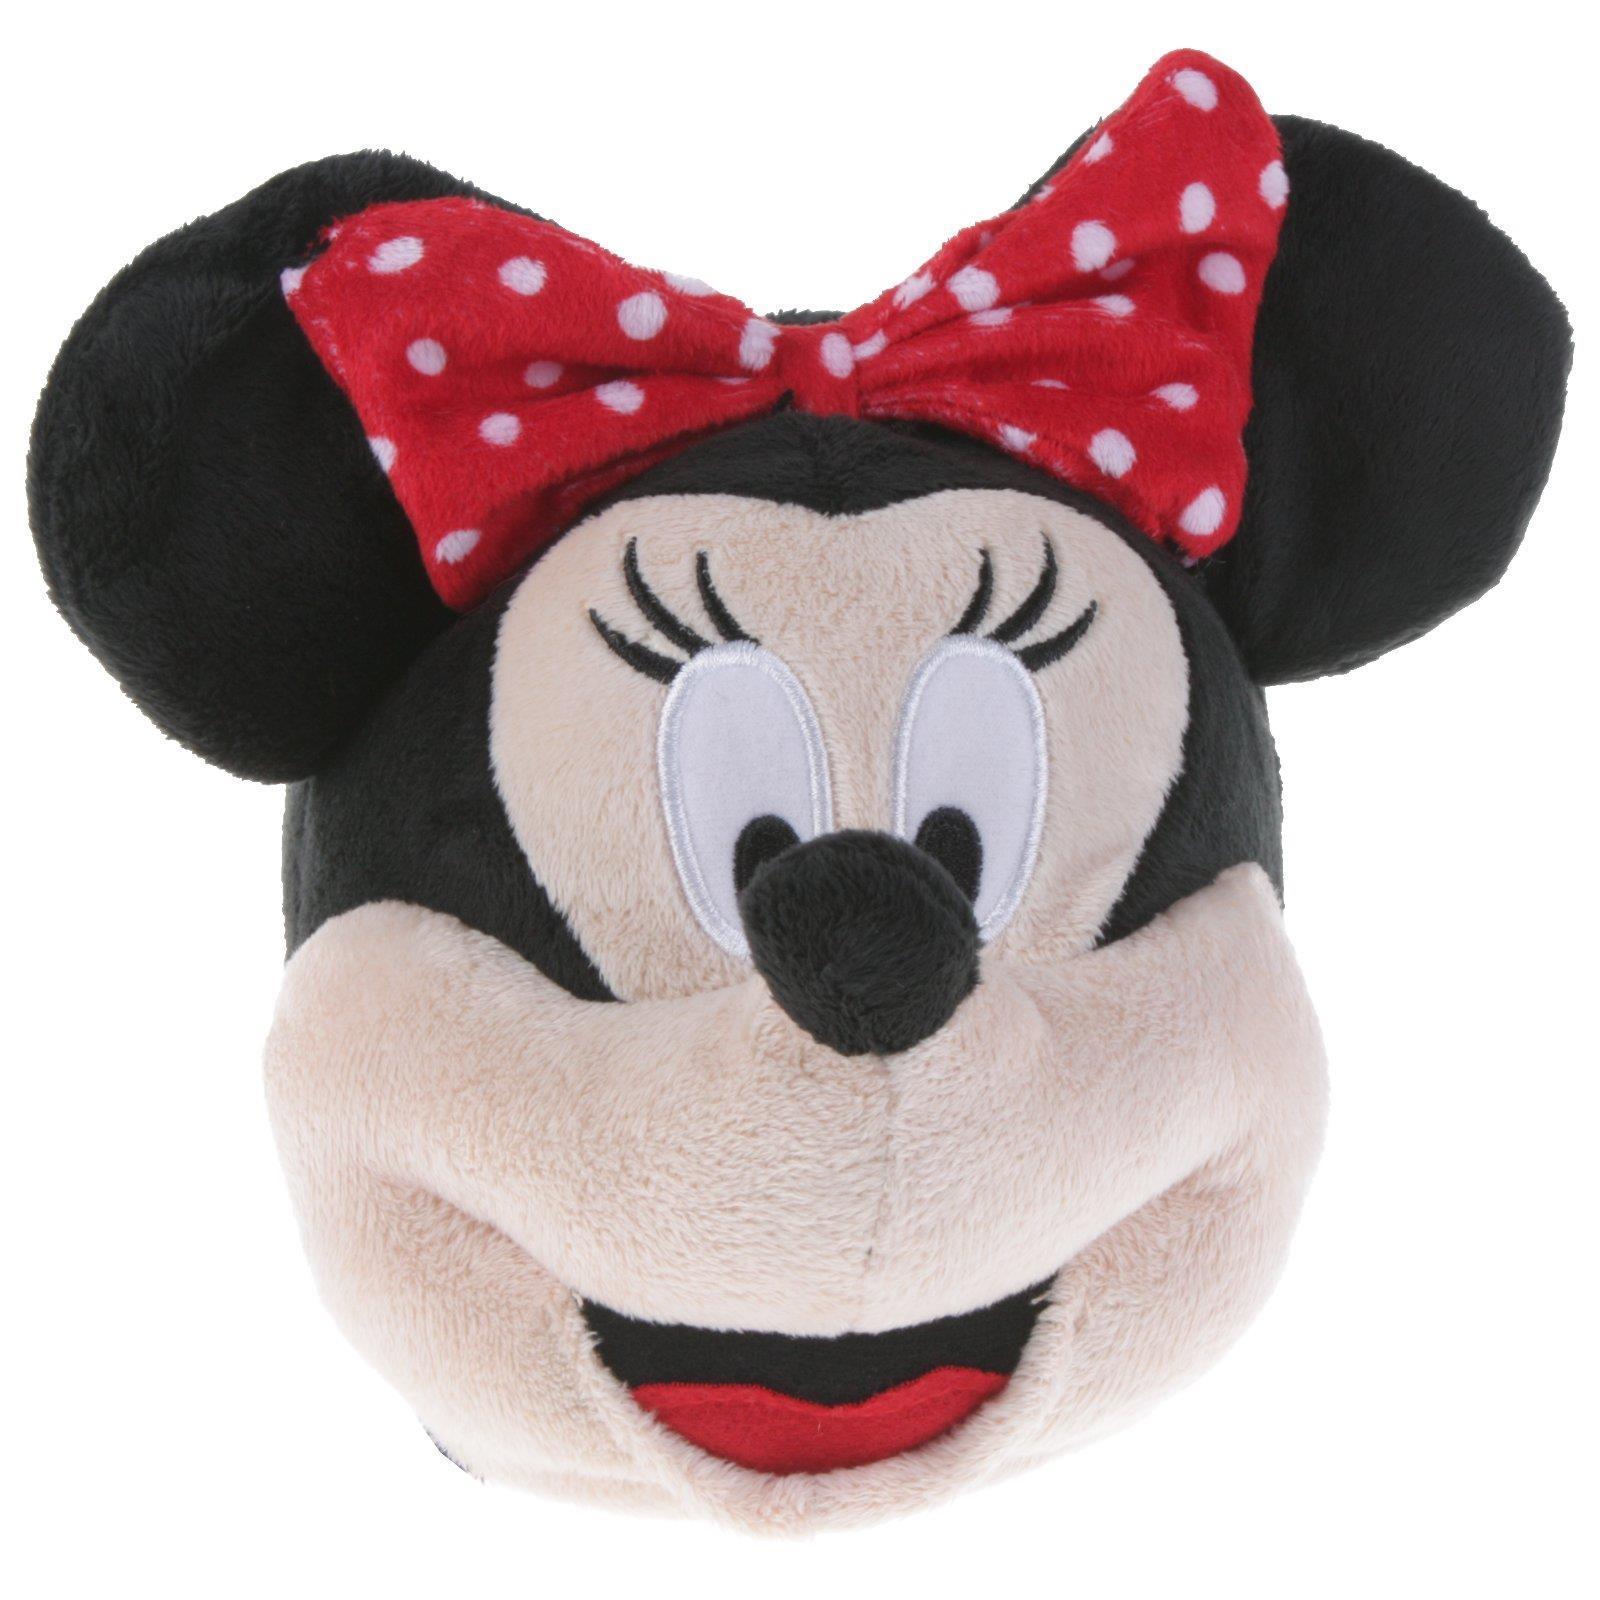 disney minnie mouse tier hausschuhe pantoffel schlappen. Black Bedroom Furniture Sets. Home Design Ideas